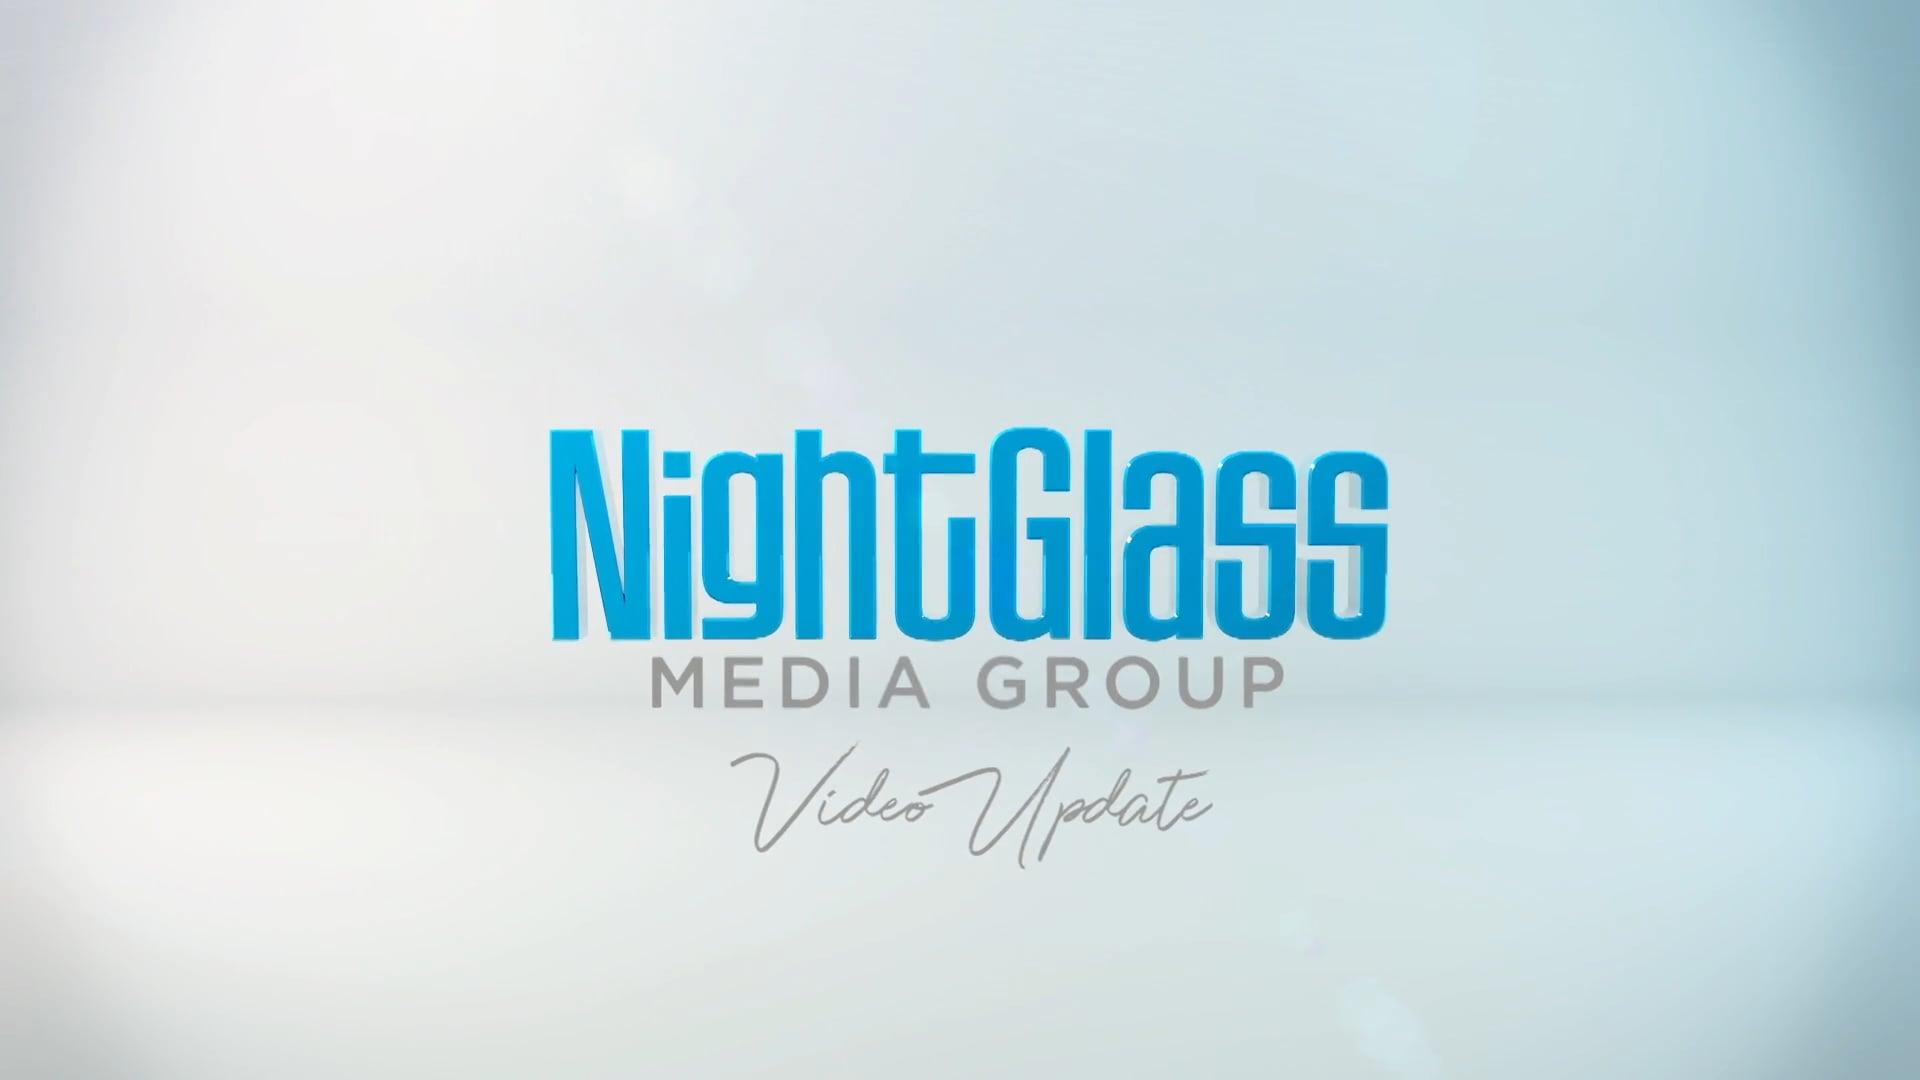 NightGlass Video Update June 2018